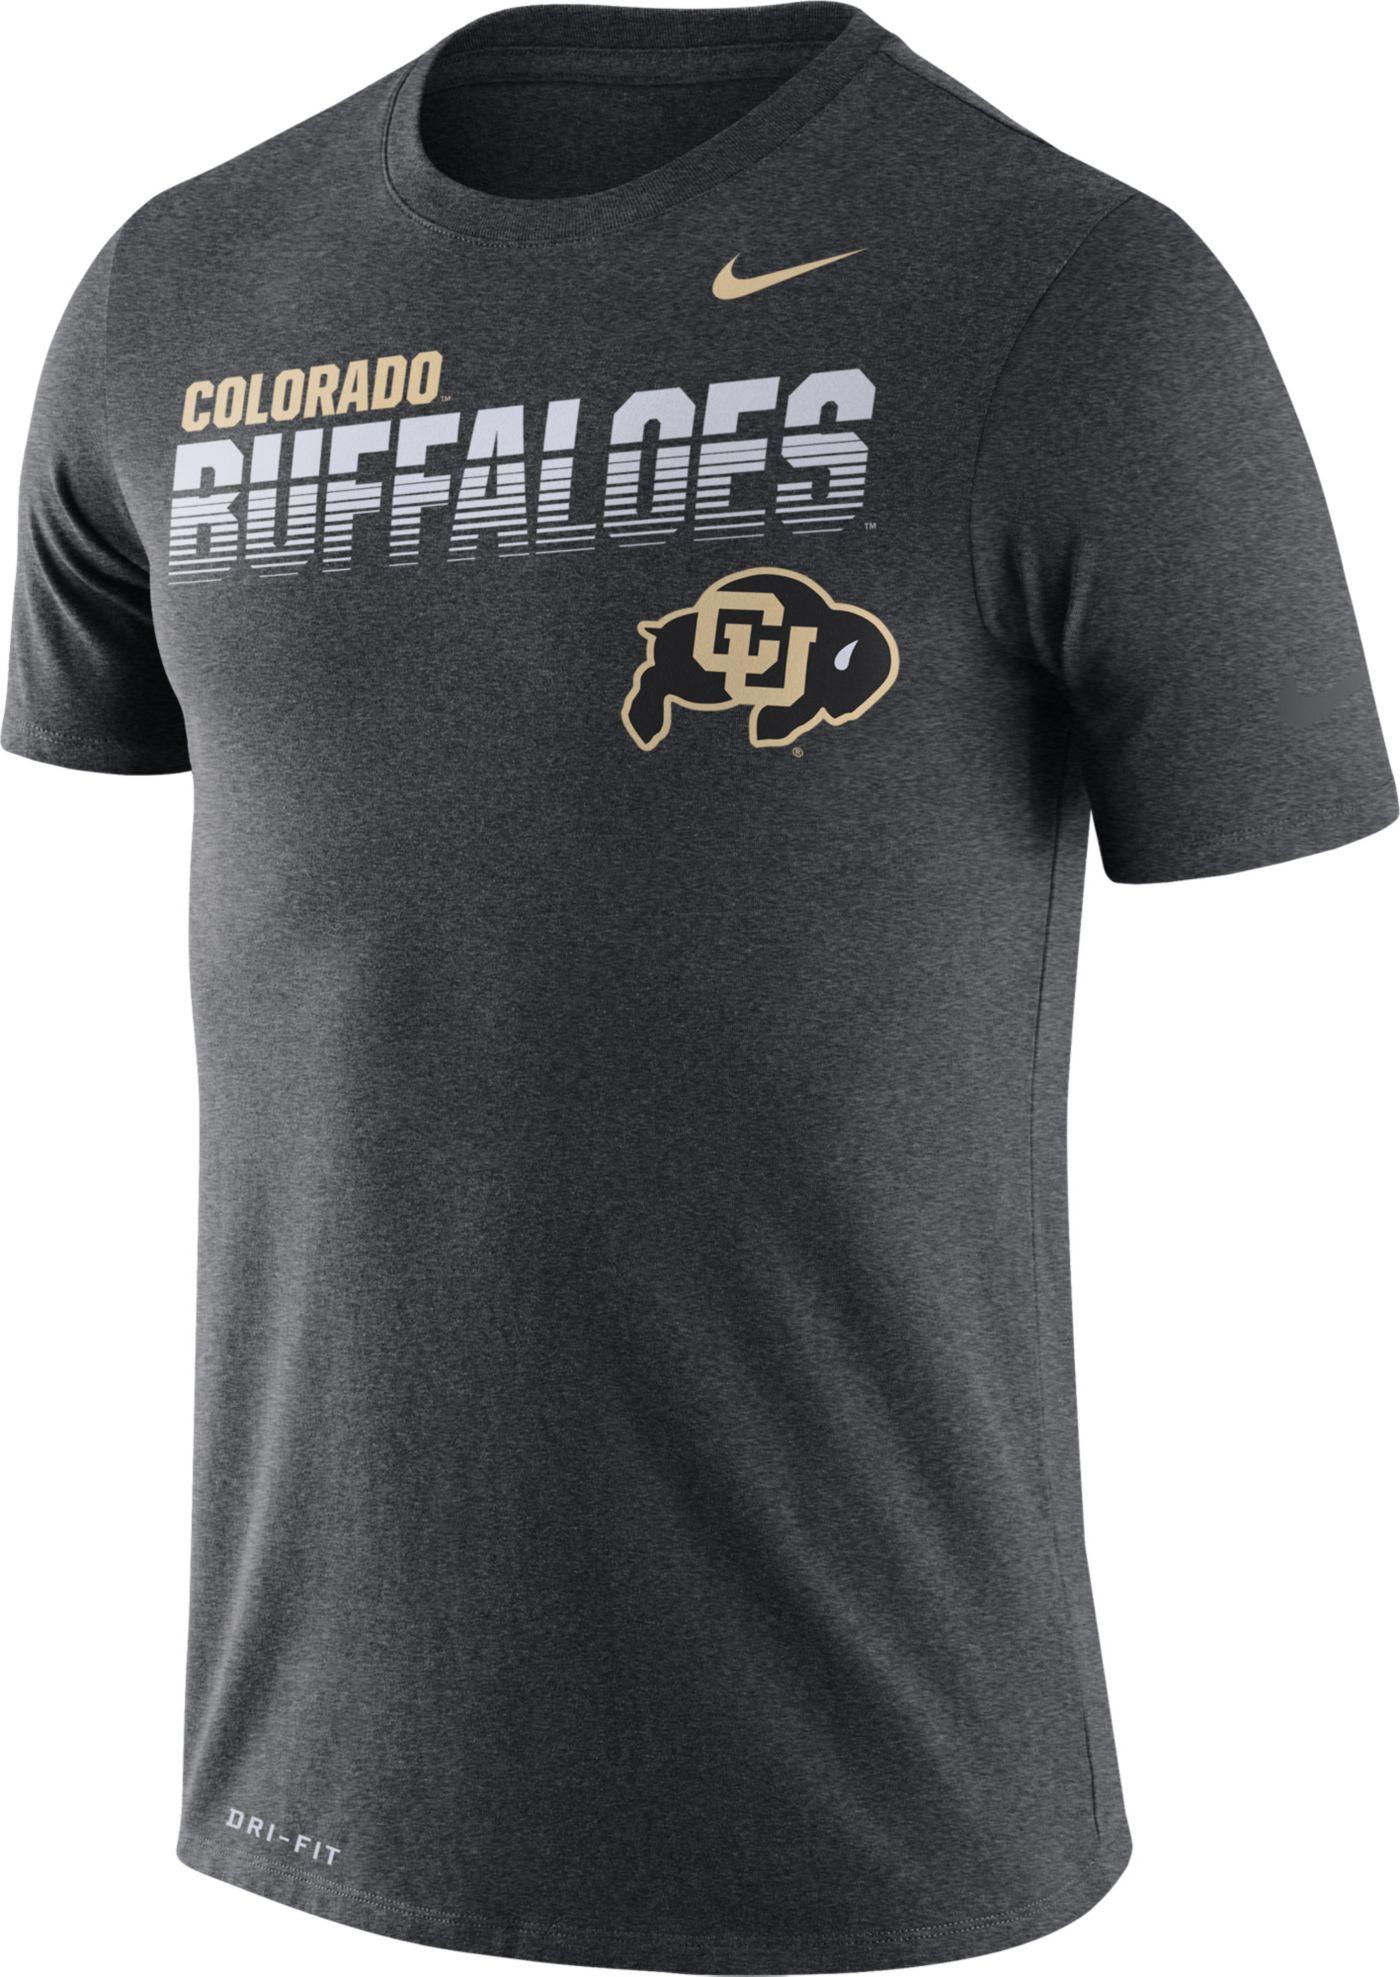 Nike Men's Colorado Buffaloes Grey Legend Football Sideline T-Shirt